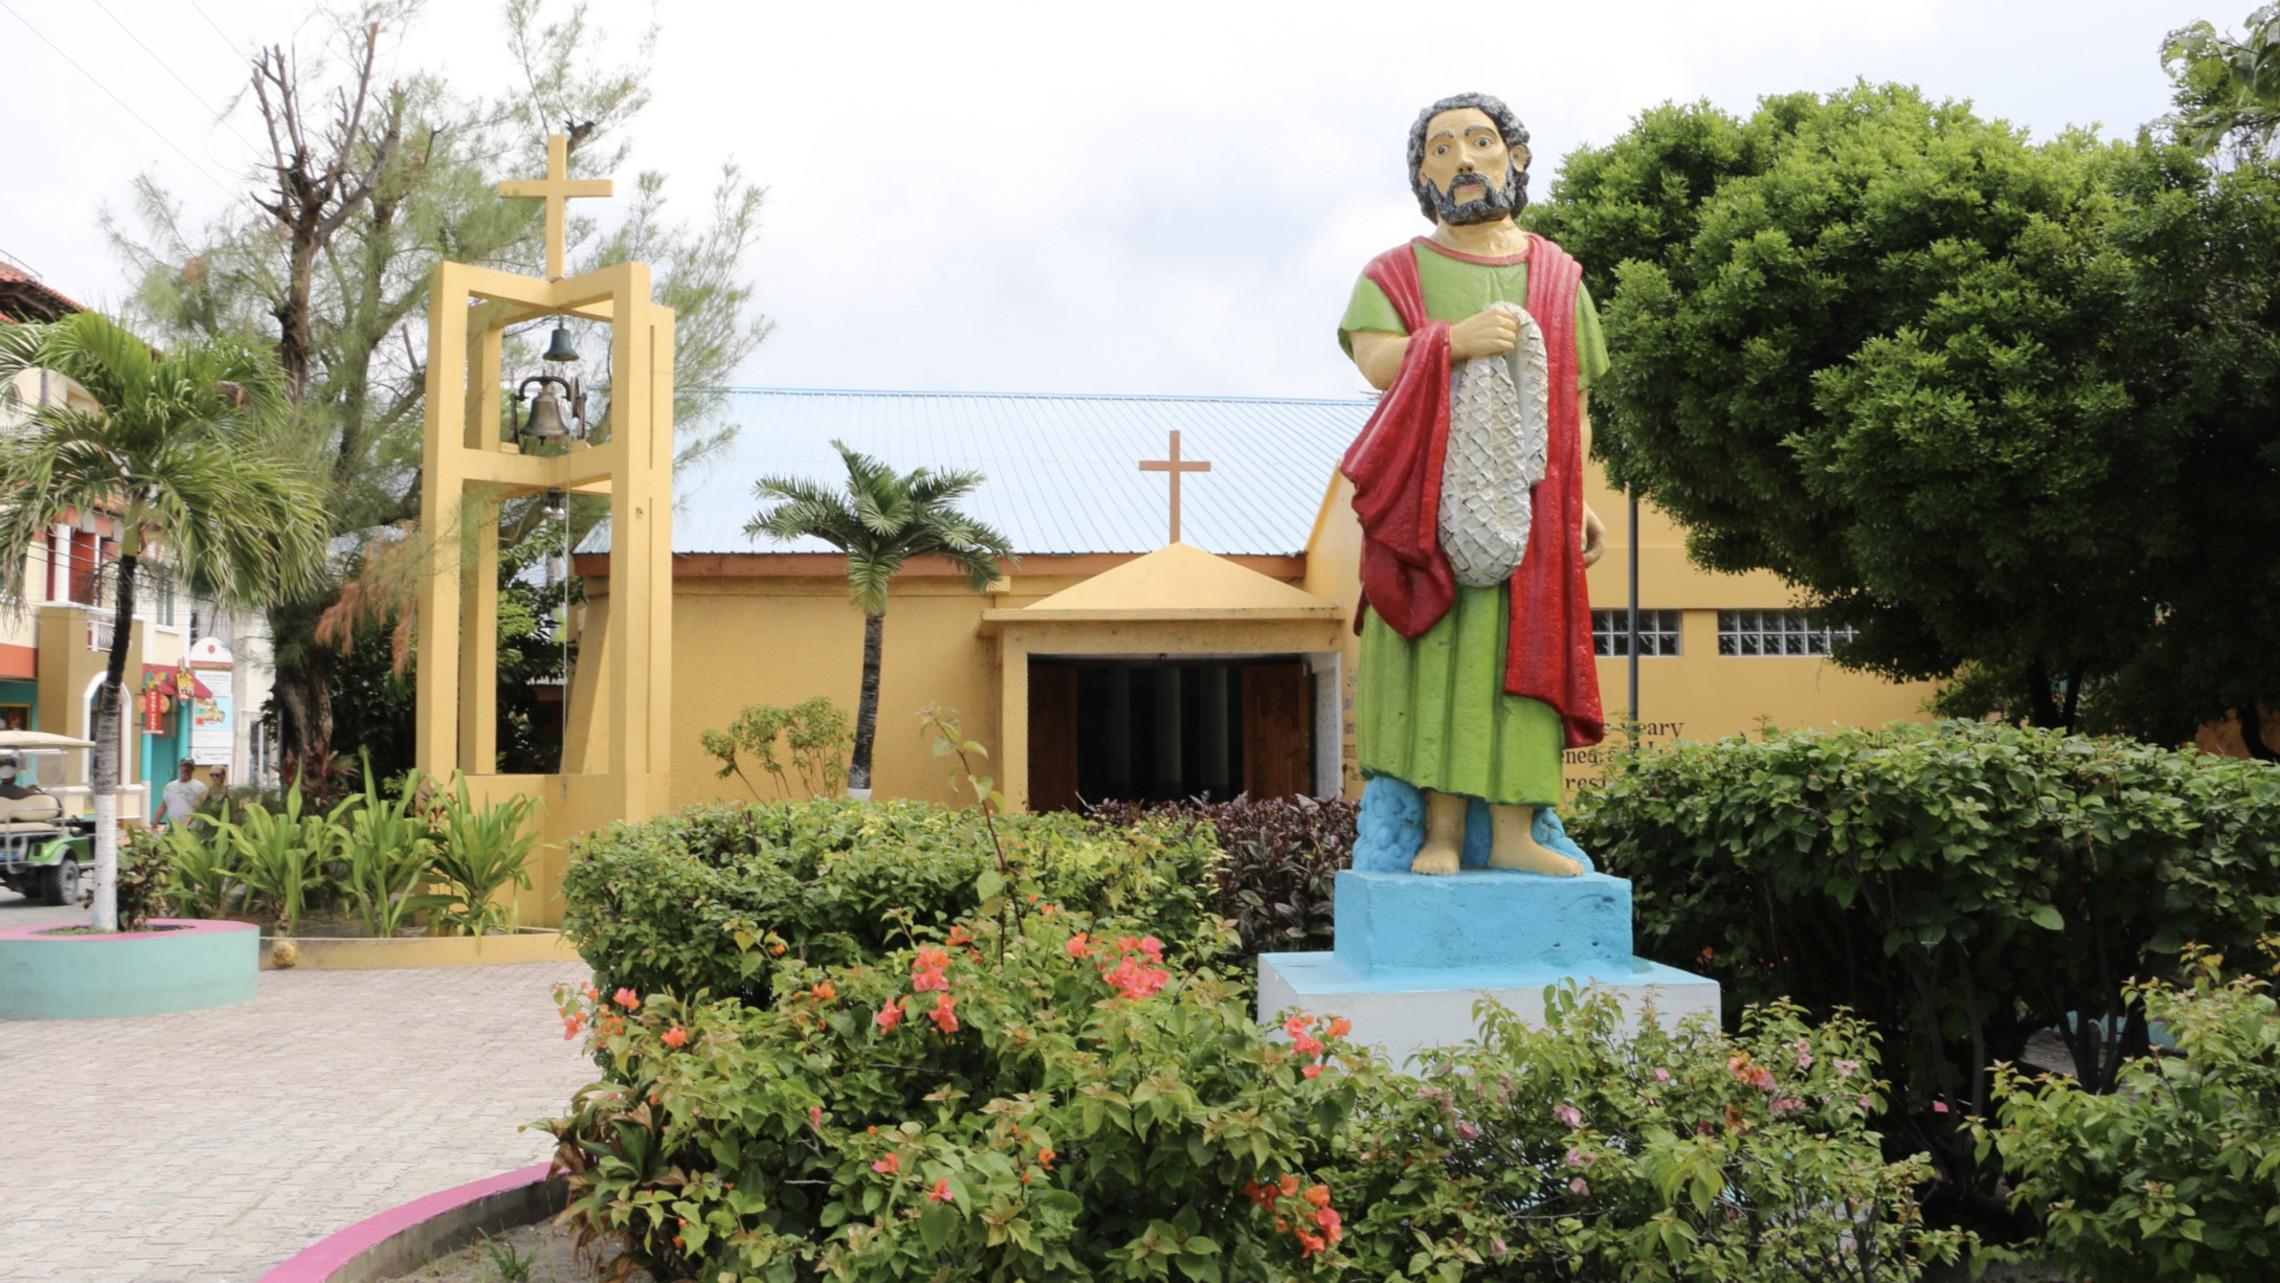 Belize City San Pedro